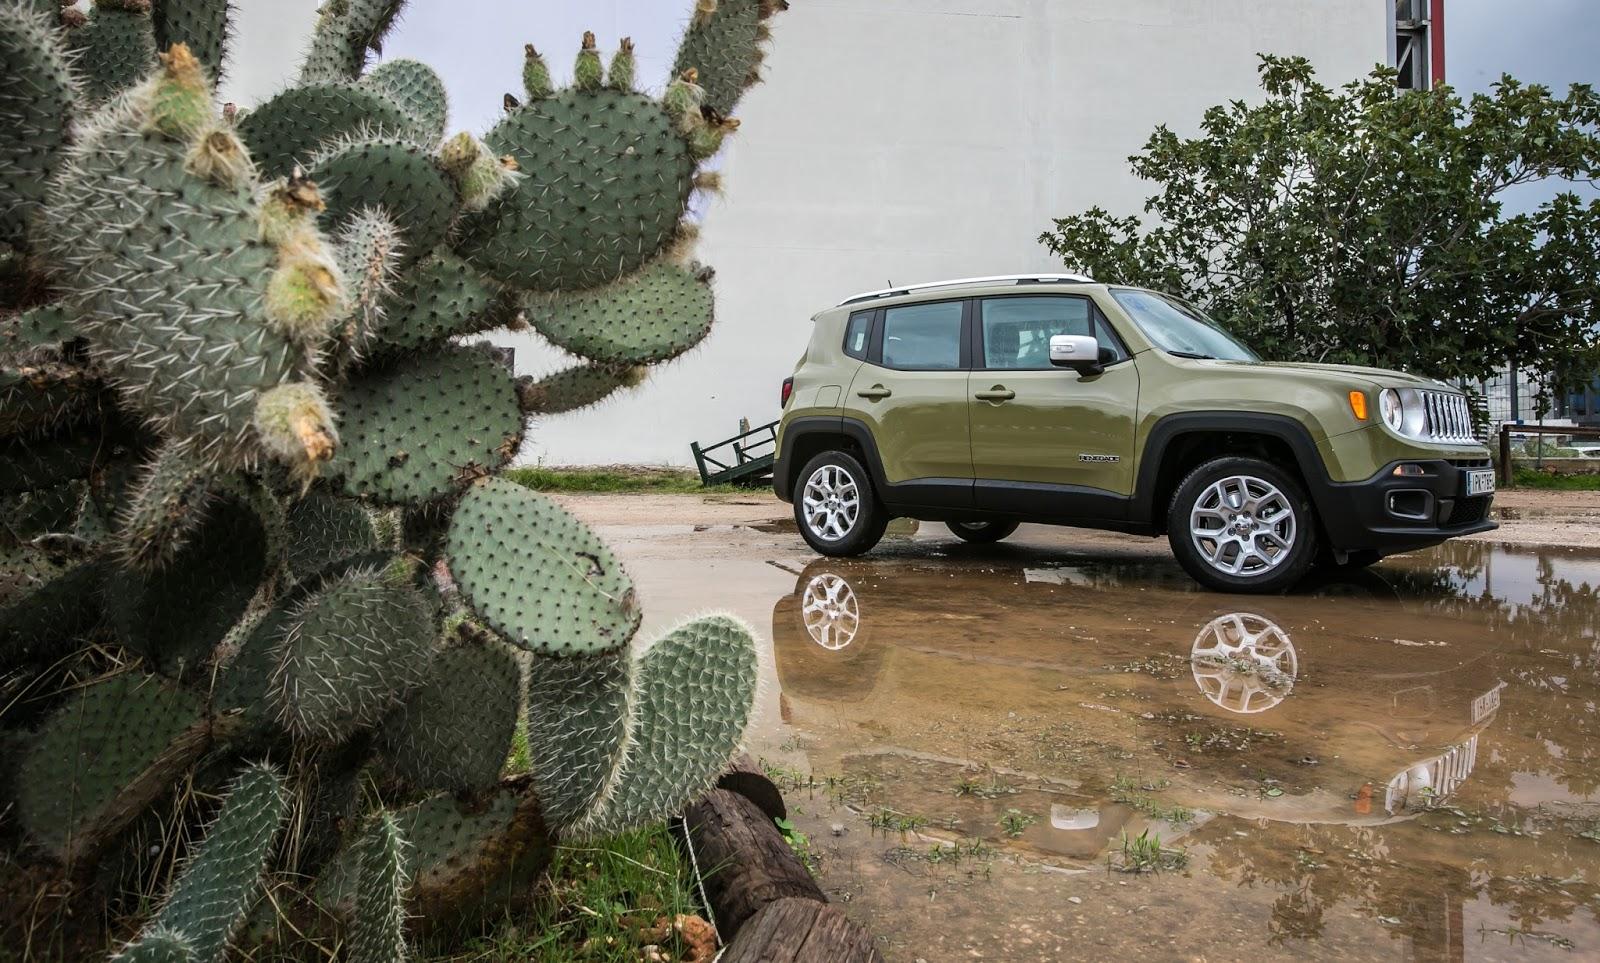 JEEP%2BCAMP GK 0238 Πετάμε ένα Jeep Renegade σε λάσπες, πέτρες, άμμο, λίμνες. Θα τα καταφέρει; Jeep, Jeep Renegade, Renegade, SUV, TEST, zblog, ΔΟΚΙΜΕΣ